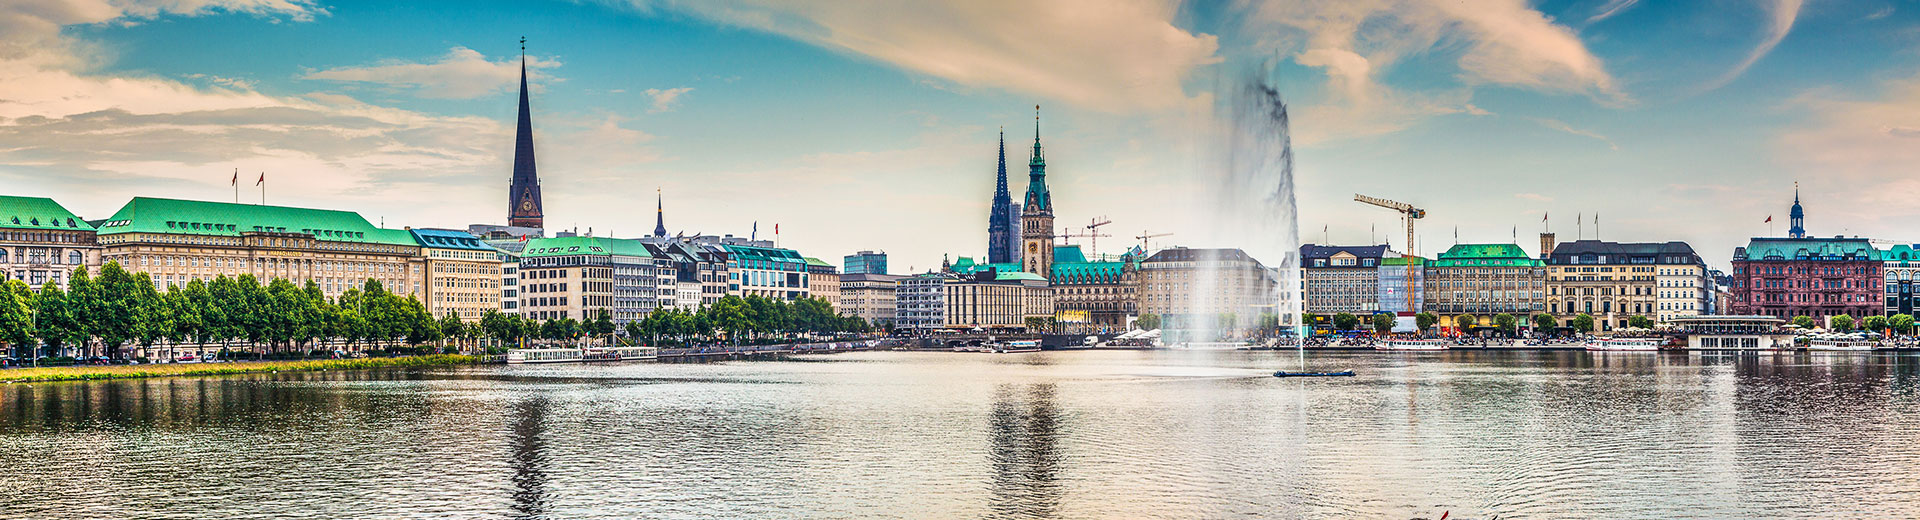 Voyage en groupe Hambourg - offre confort avion